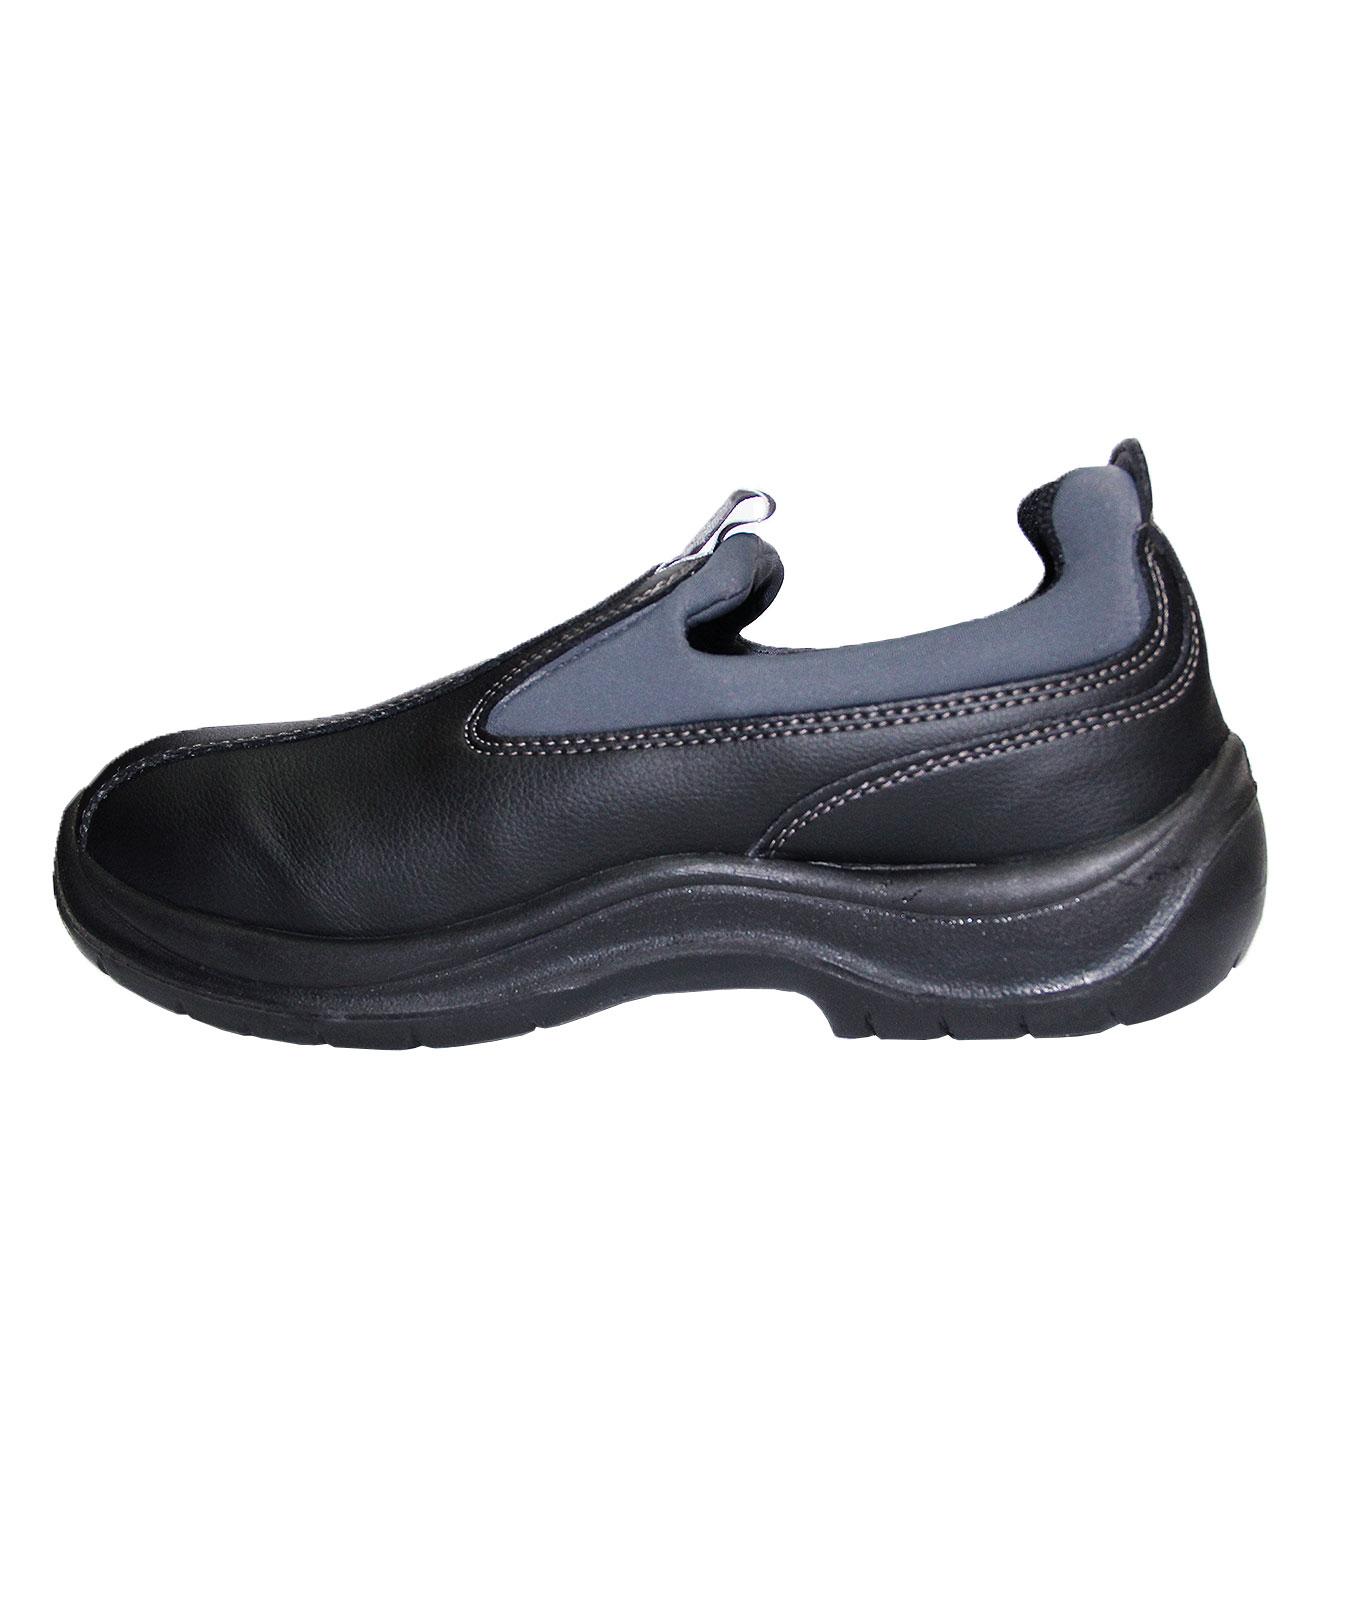 MALIBU παπούτσι εργασίας 3